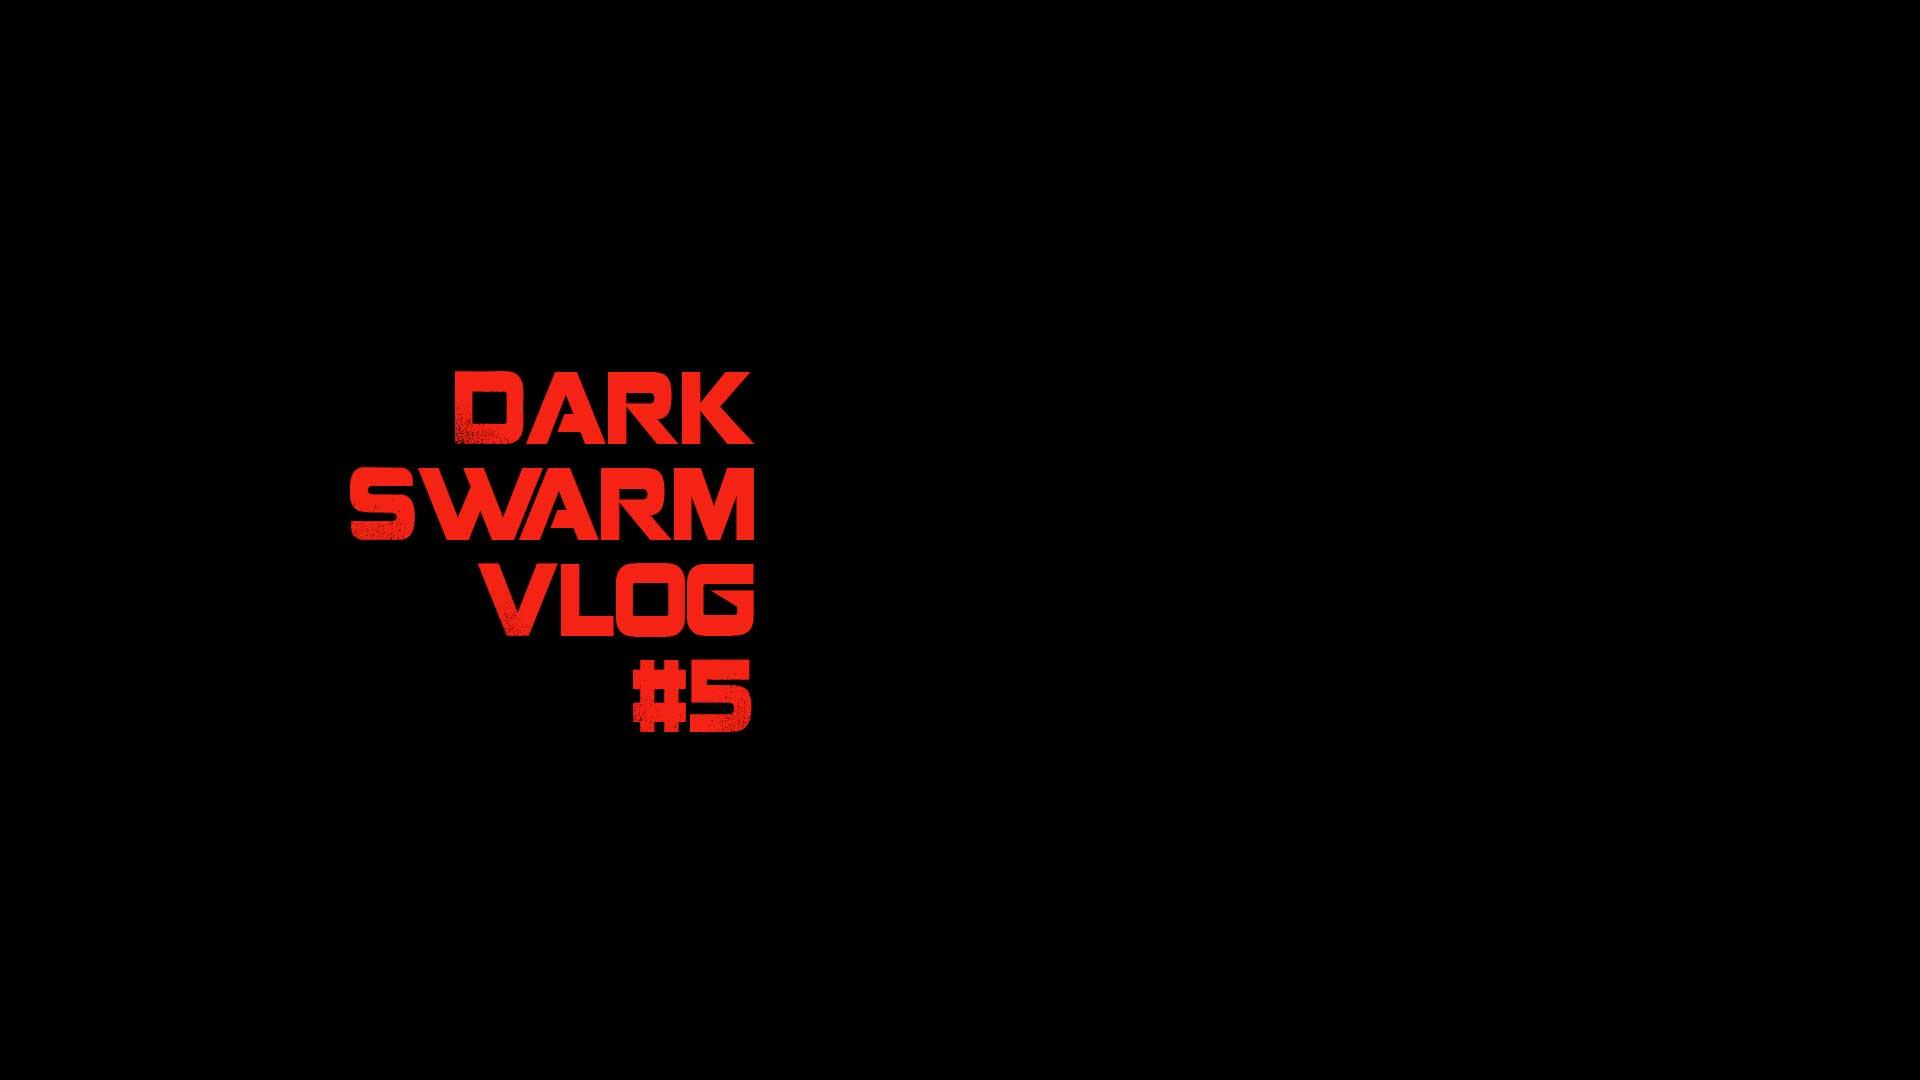 dark swarm 5 vlog